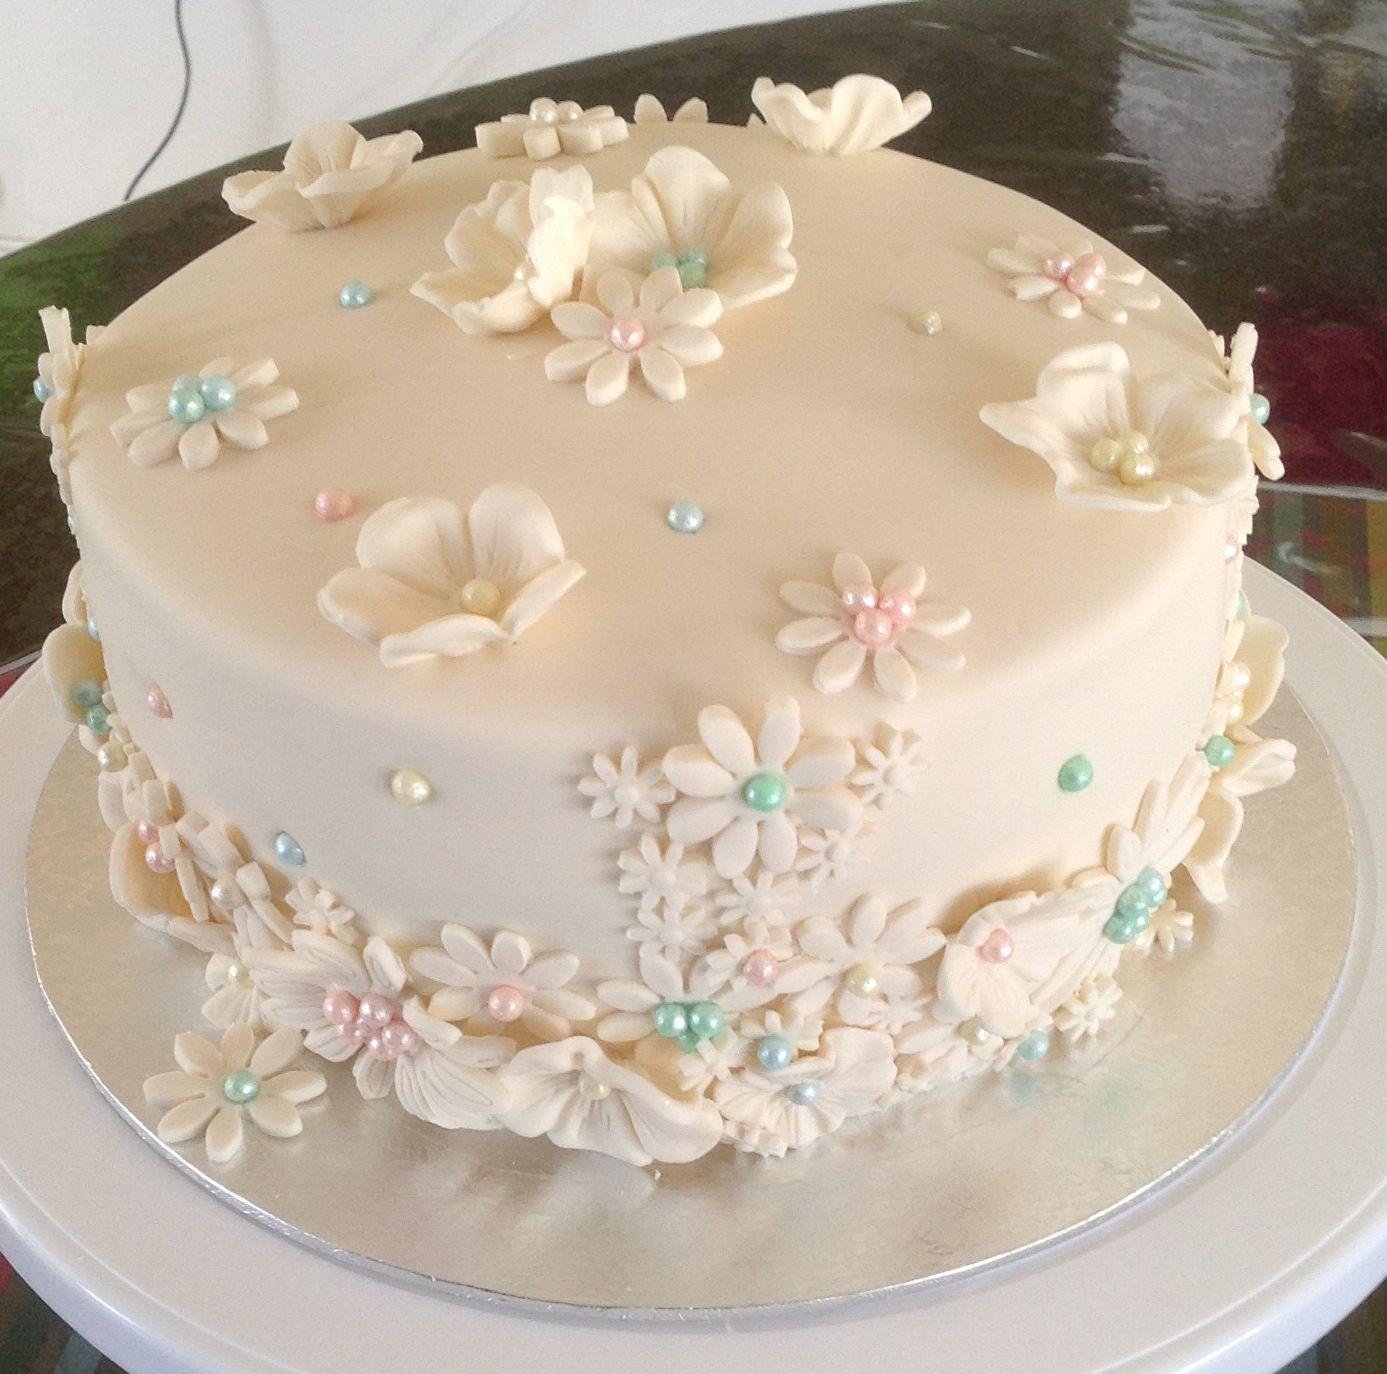 My Birthday Cake Lemon And Orange Cake Recipes From Pinterest With My Favourite Cream Cheese Frosting And Ivory Fondant L Orange Cake Orange Cake Recipe Cake